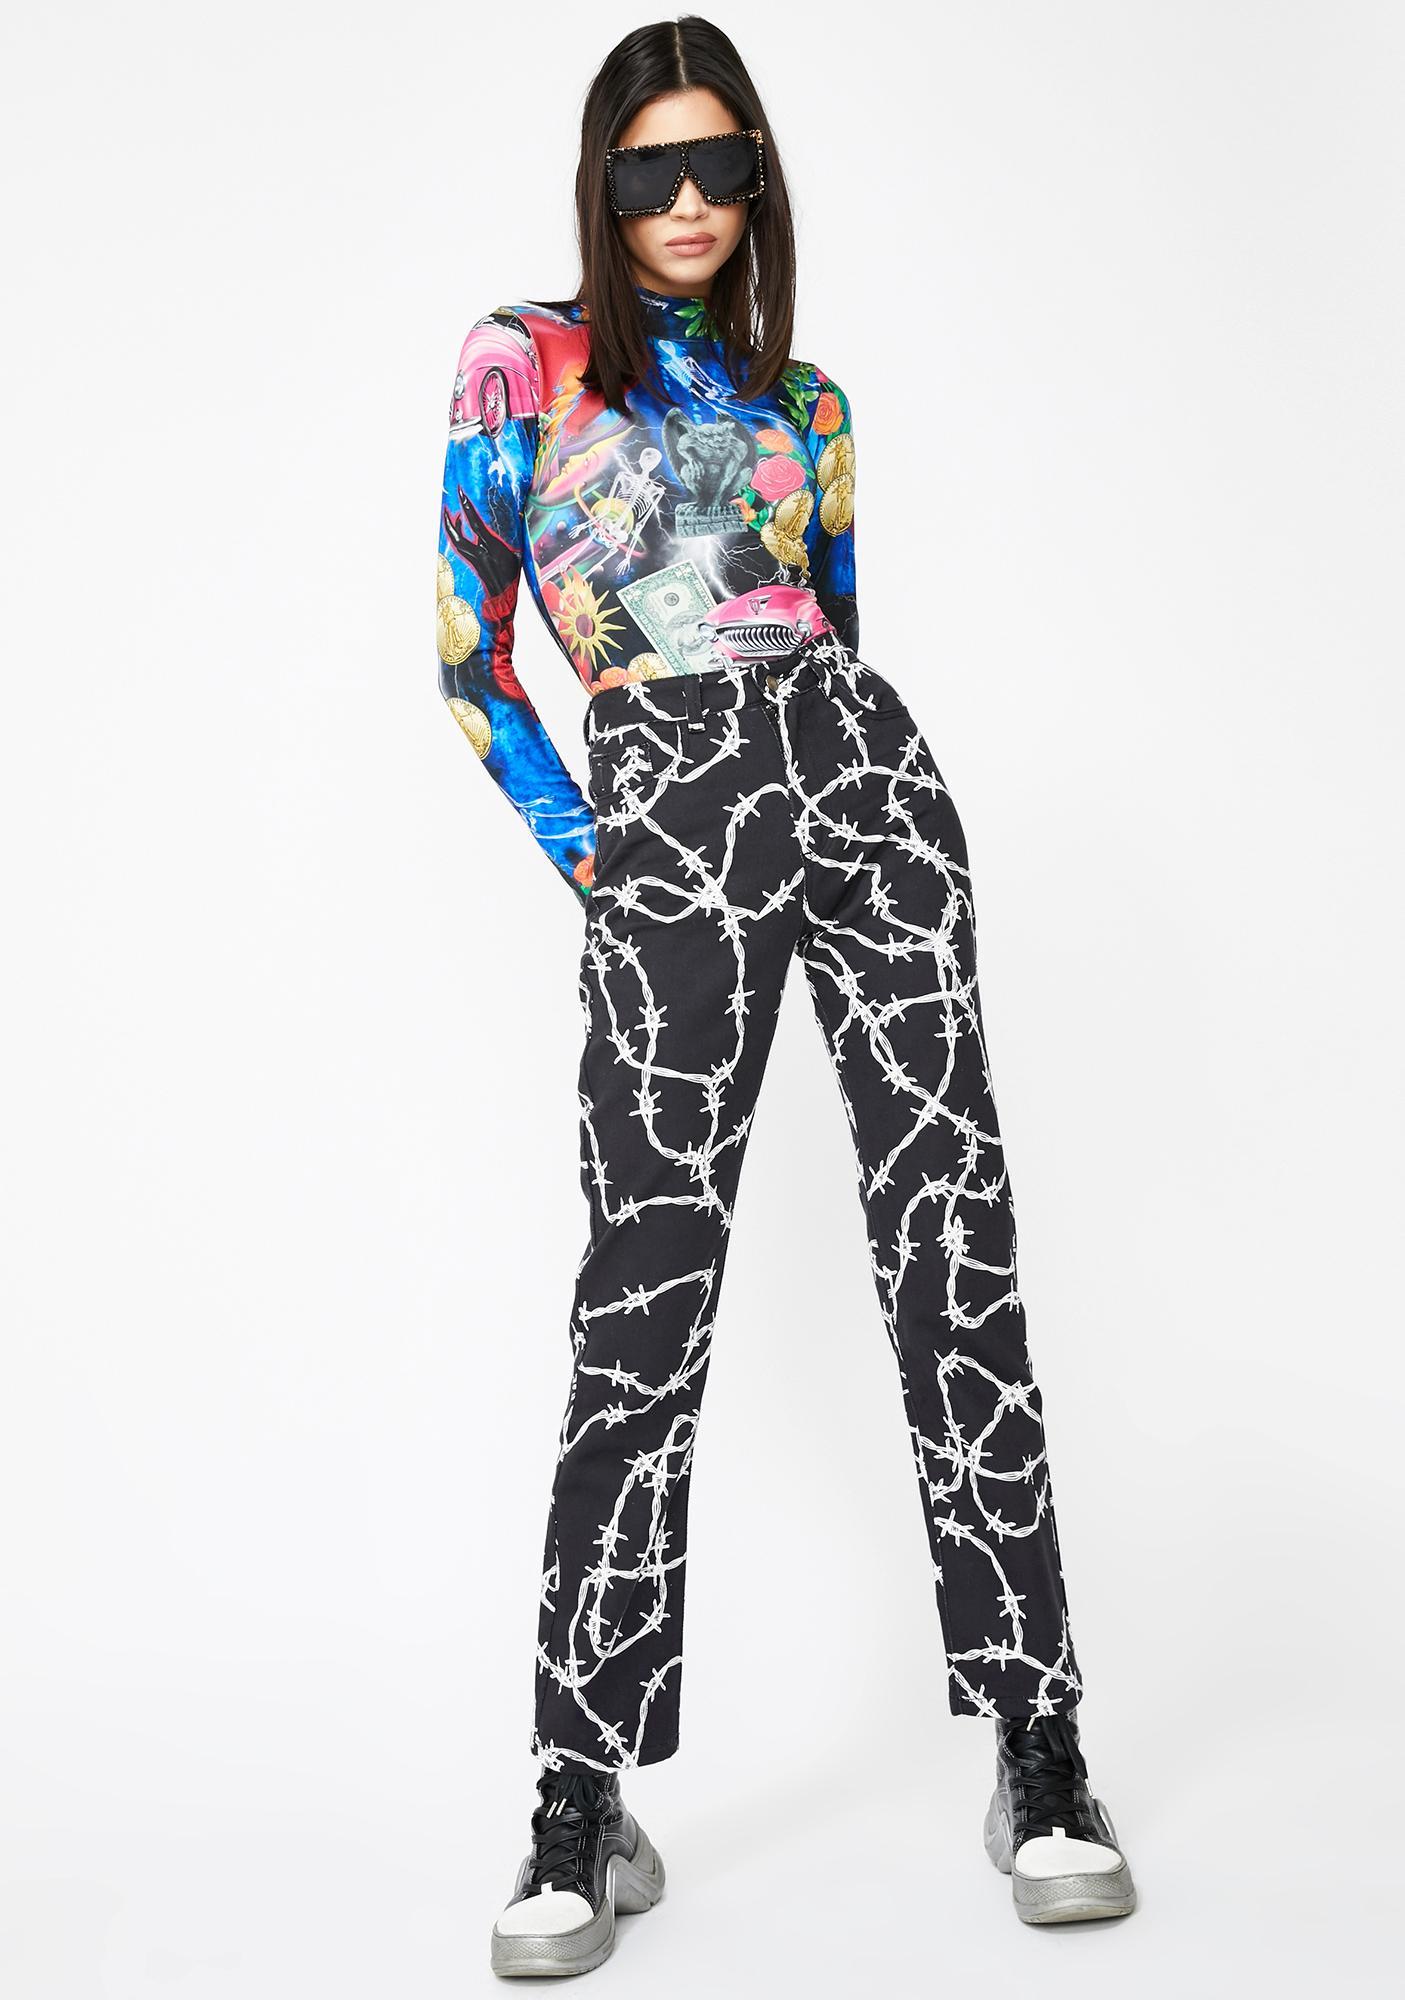 Jaded London Retro 80s Collage Print Bodysuit